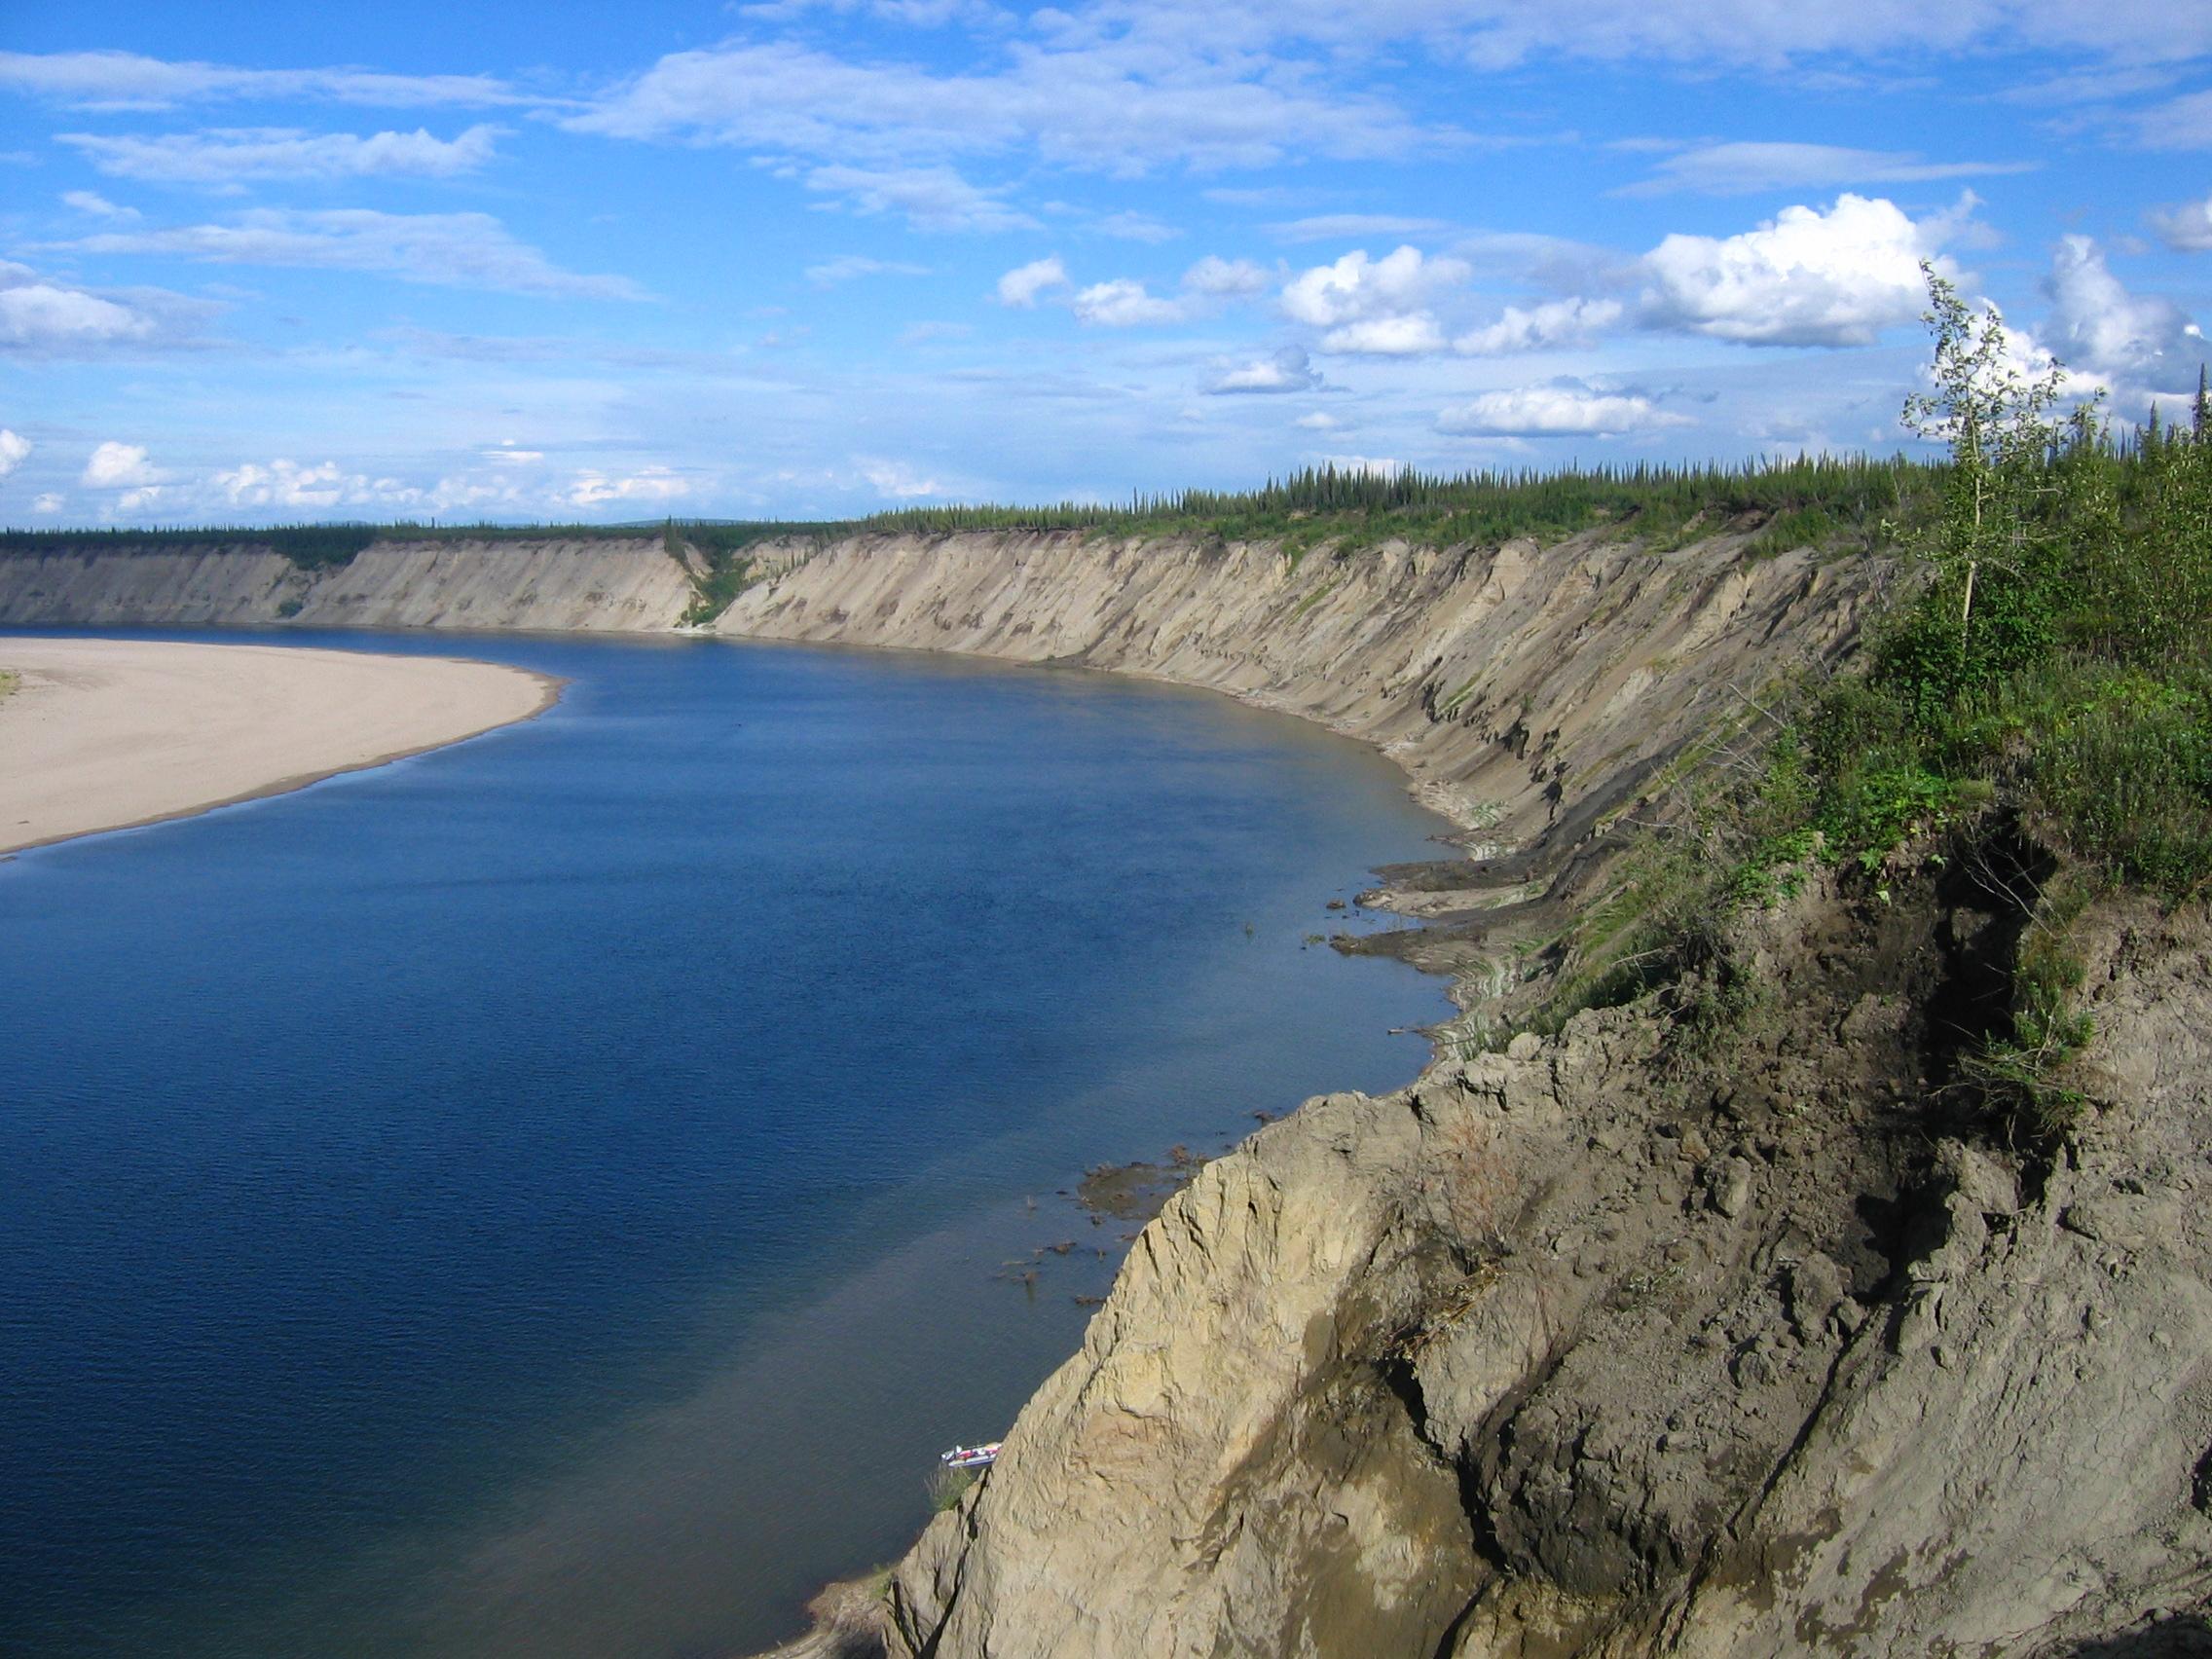 Ch'ijee's Bluff, where the 130,000-year-old bison bone was found.